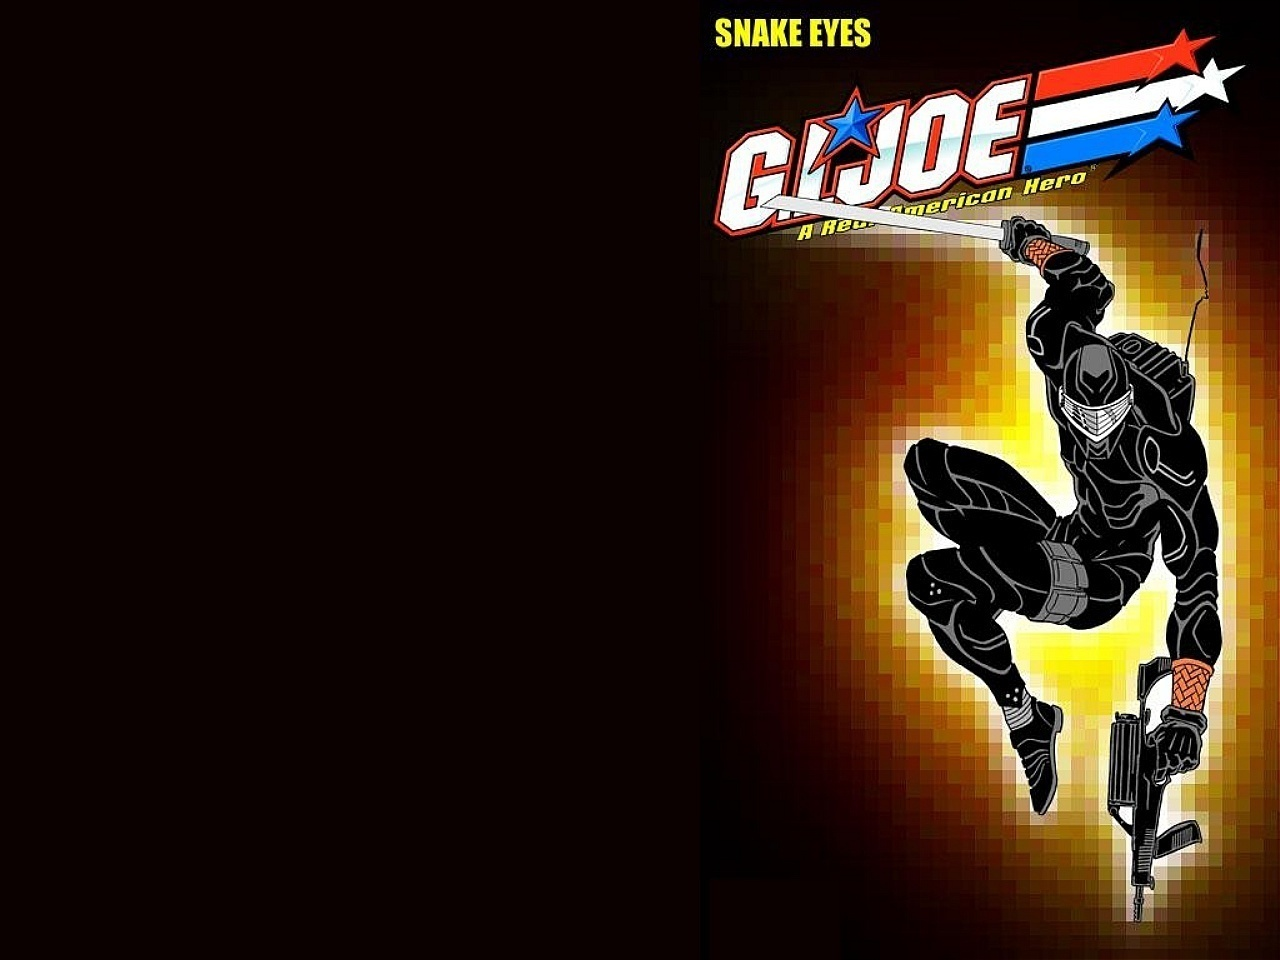 GI Joe   Snake Eyes   Wallpaper 18517 1280x960